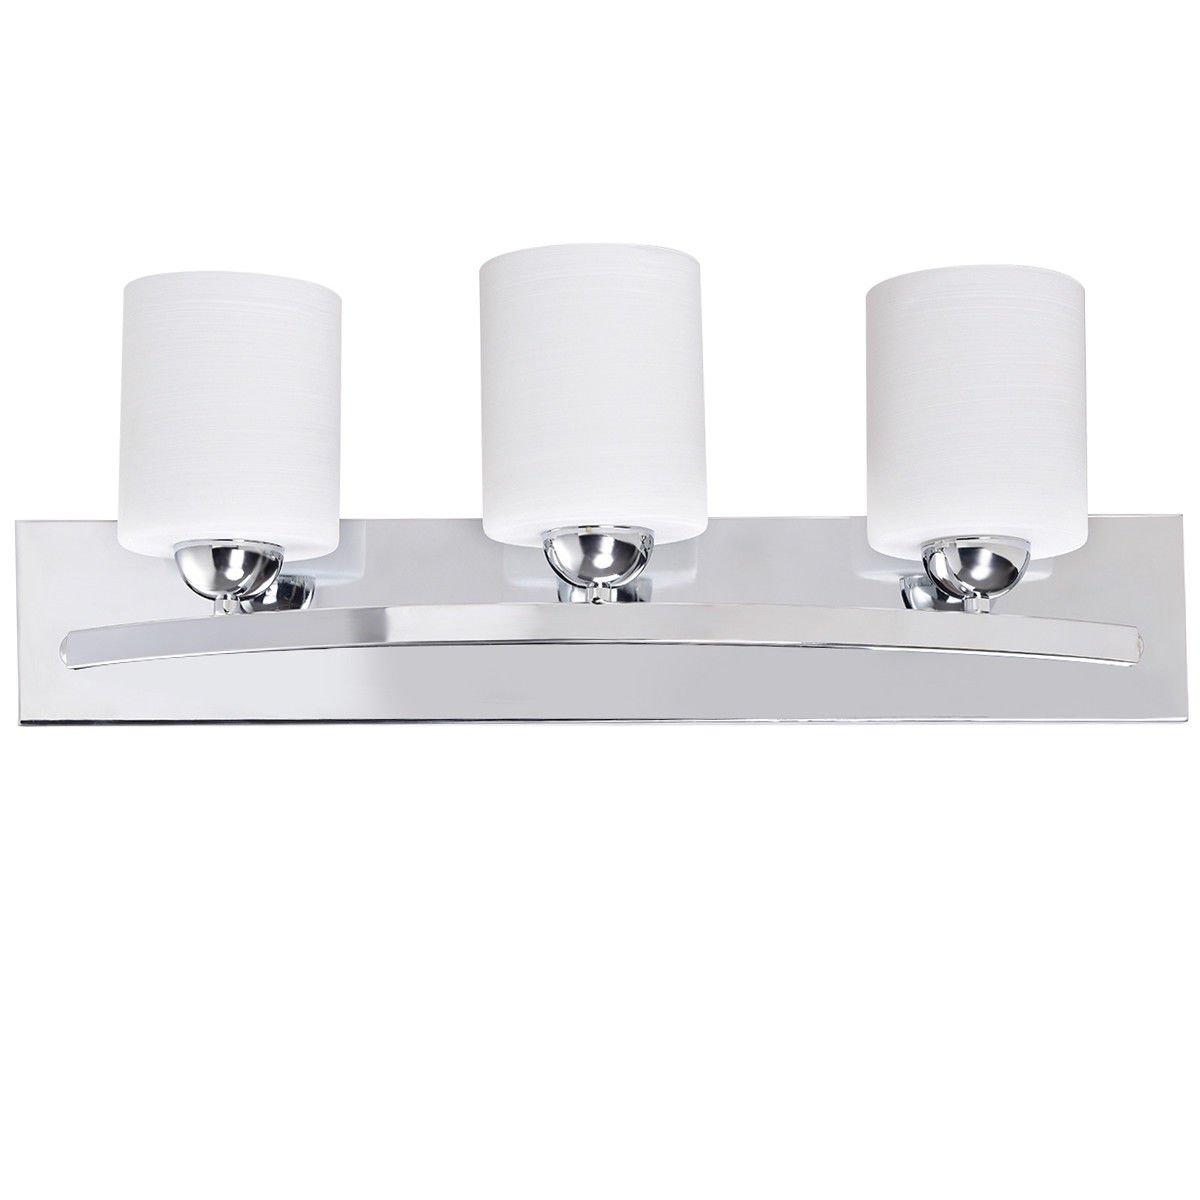 Tangkula bathroom vanity lamp brushed chrome lighting fixture with white lined glass shade wall sconce light lighting chrome 3 amazon com